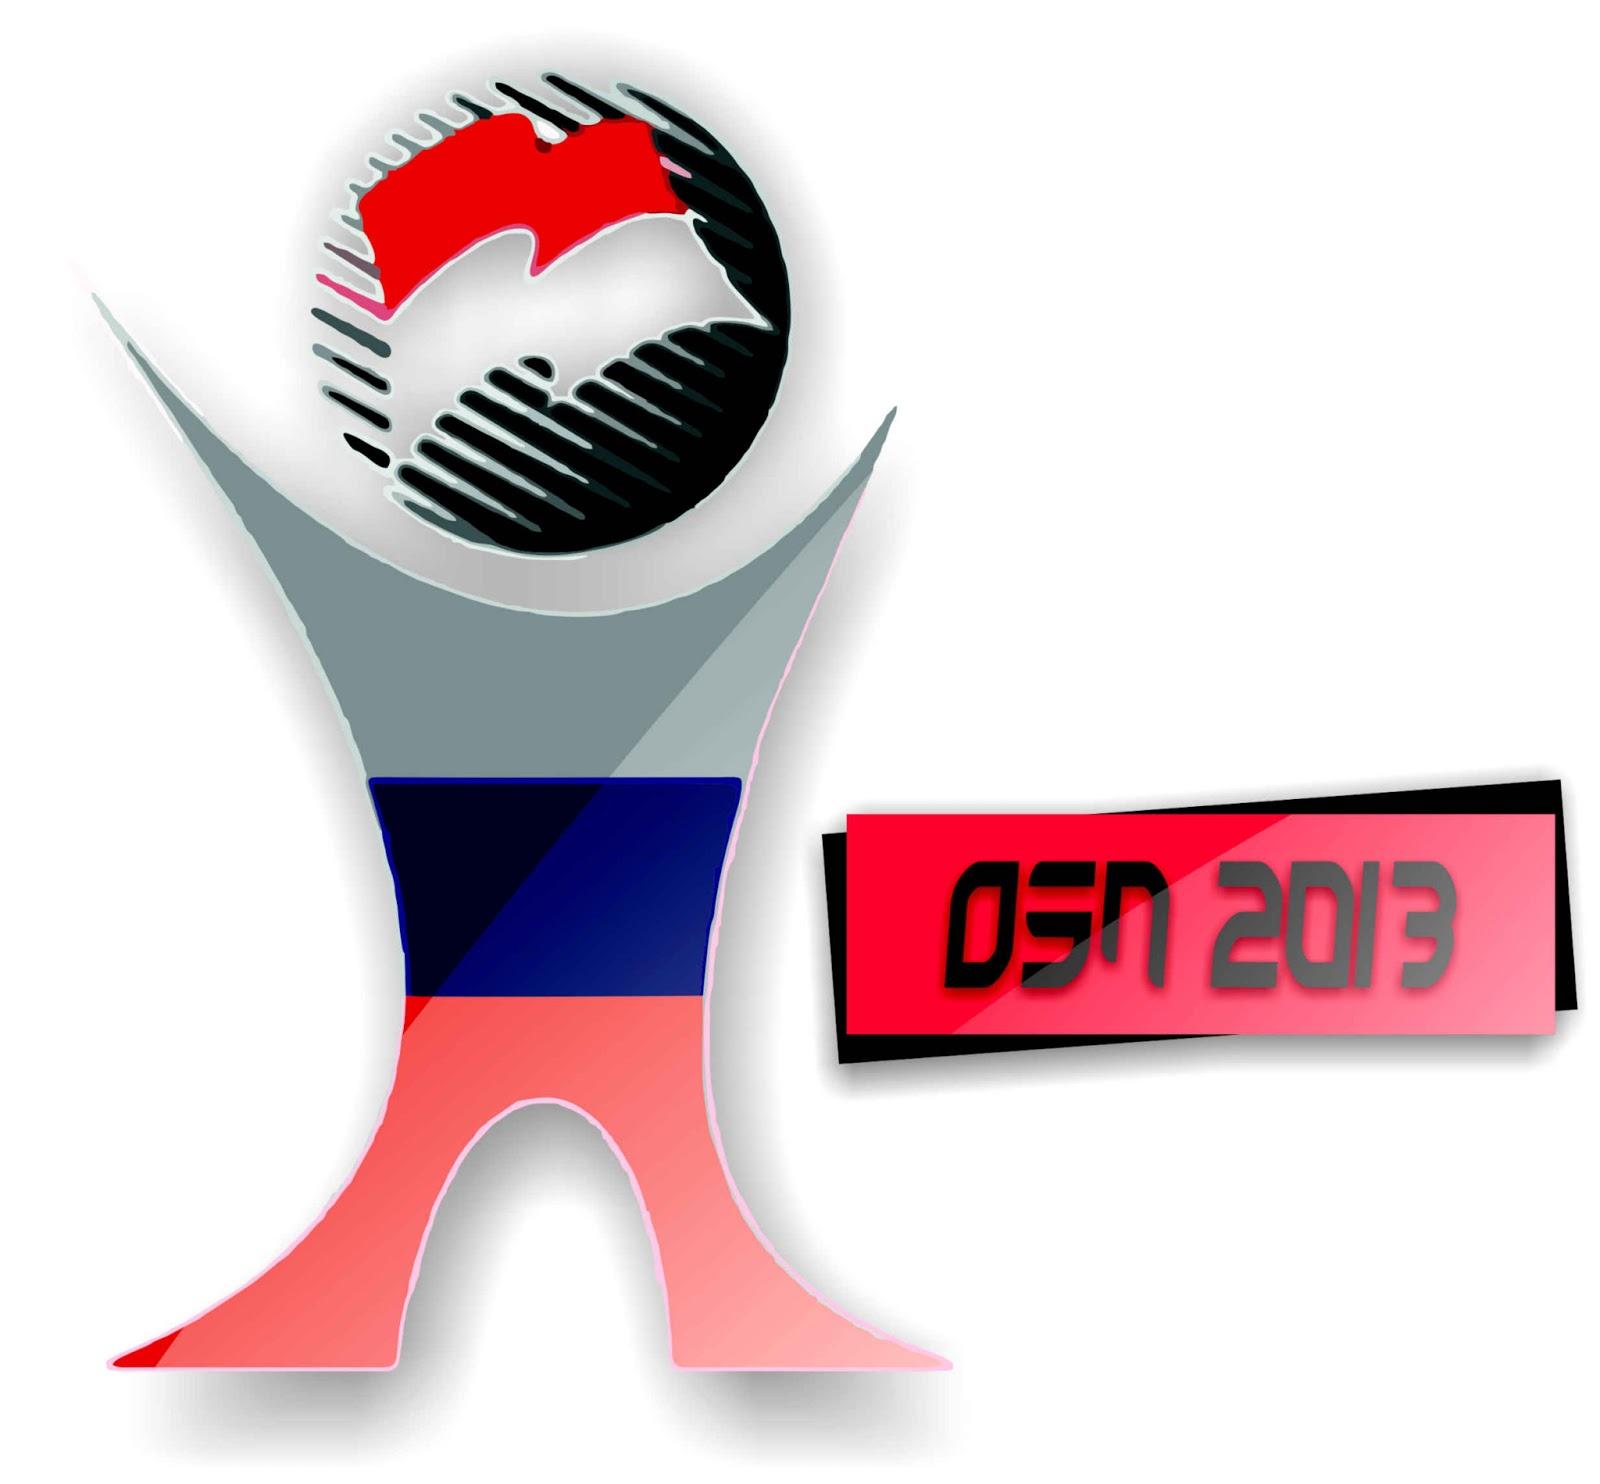 Kumpulan Soal-soal OSN Tahun 2013 Tk. Kabupaten